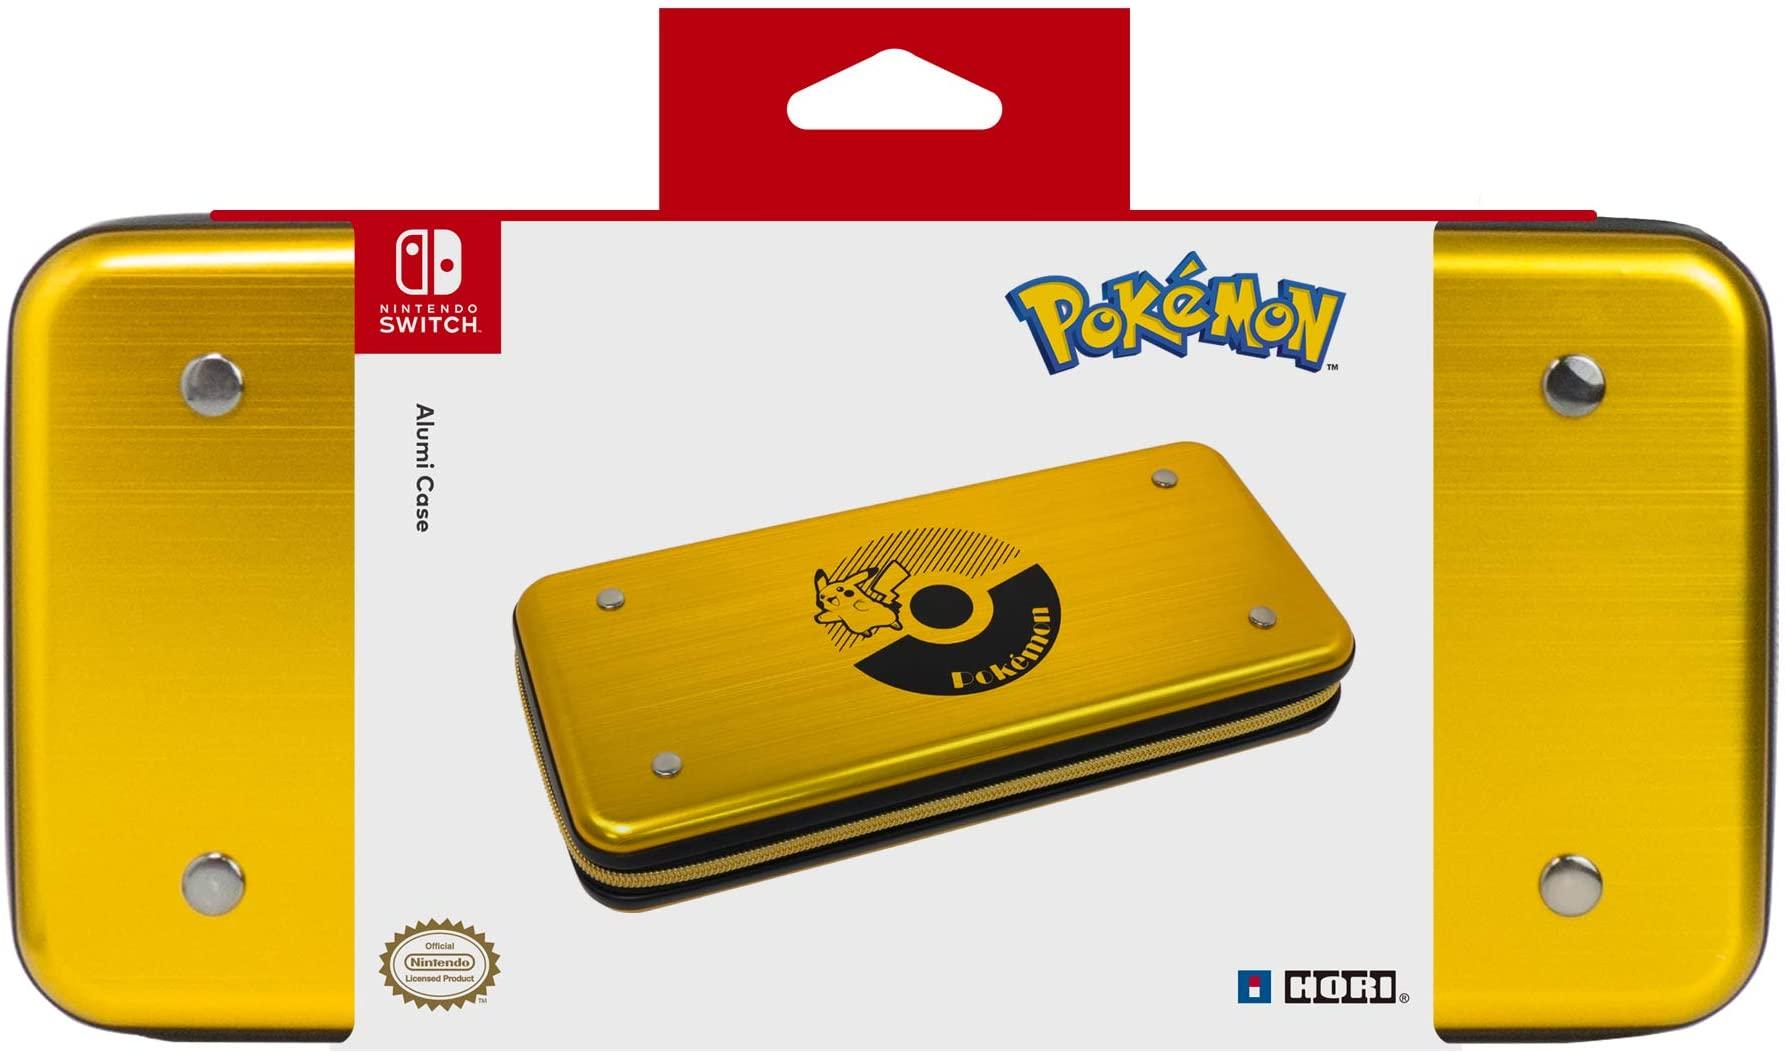 Case Alumínio Hori Pokemon Alumicase - Nintendo Switch